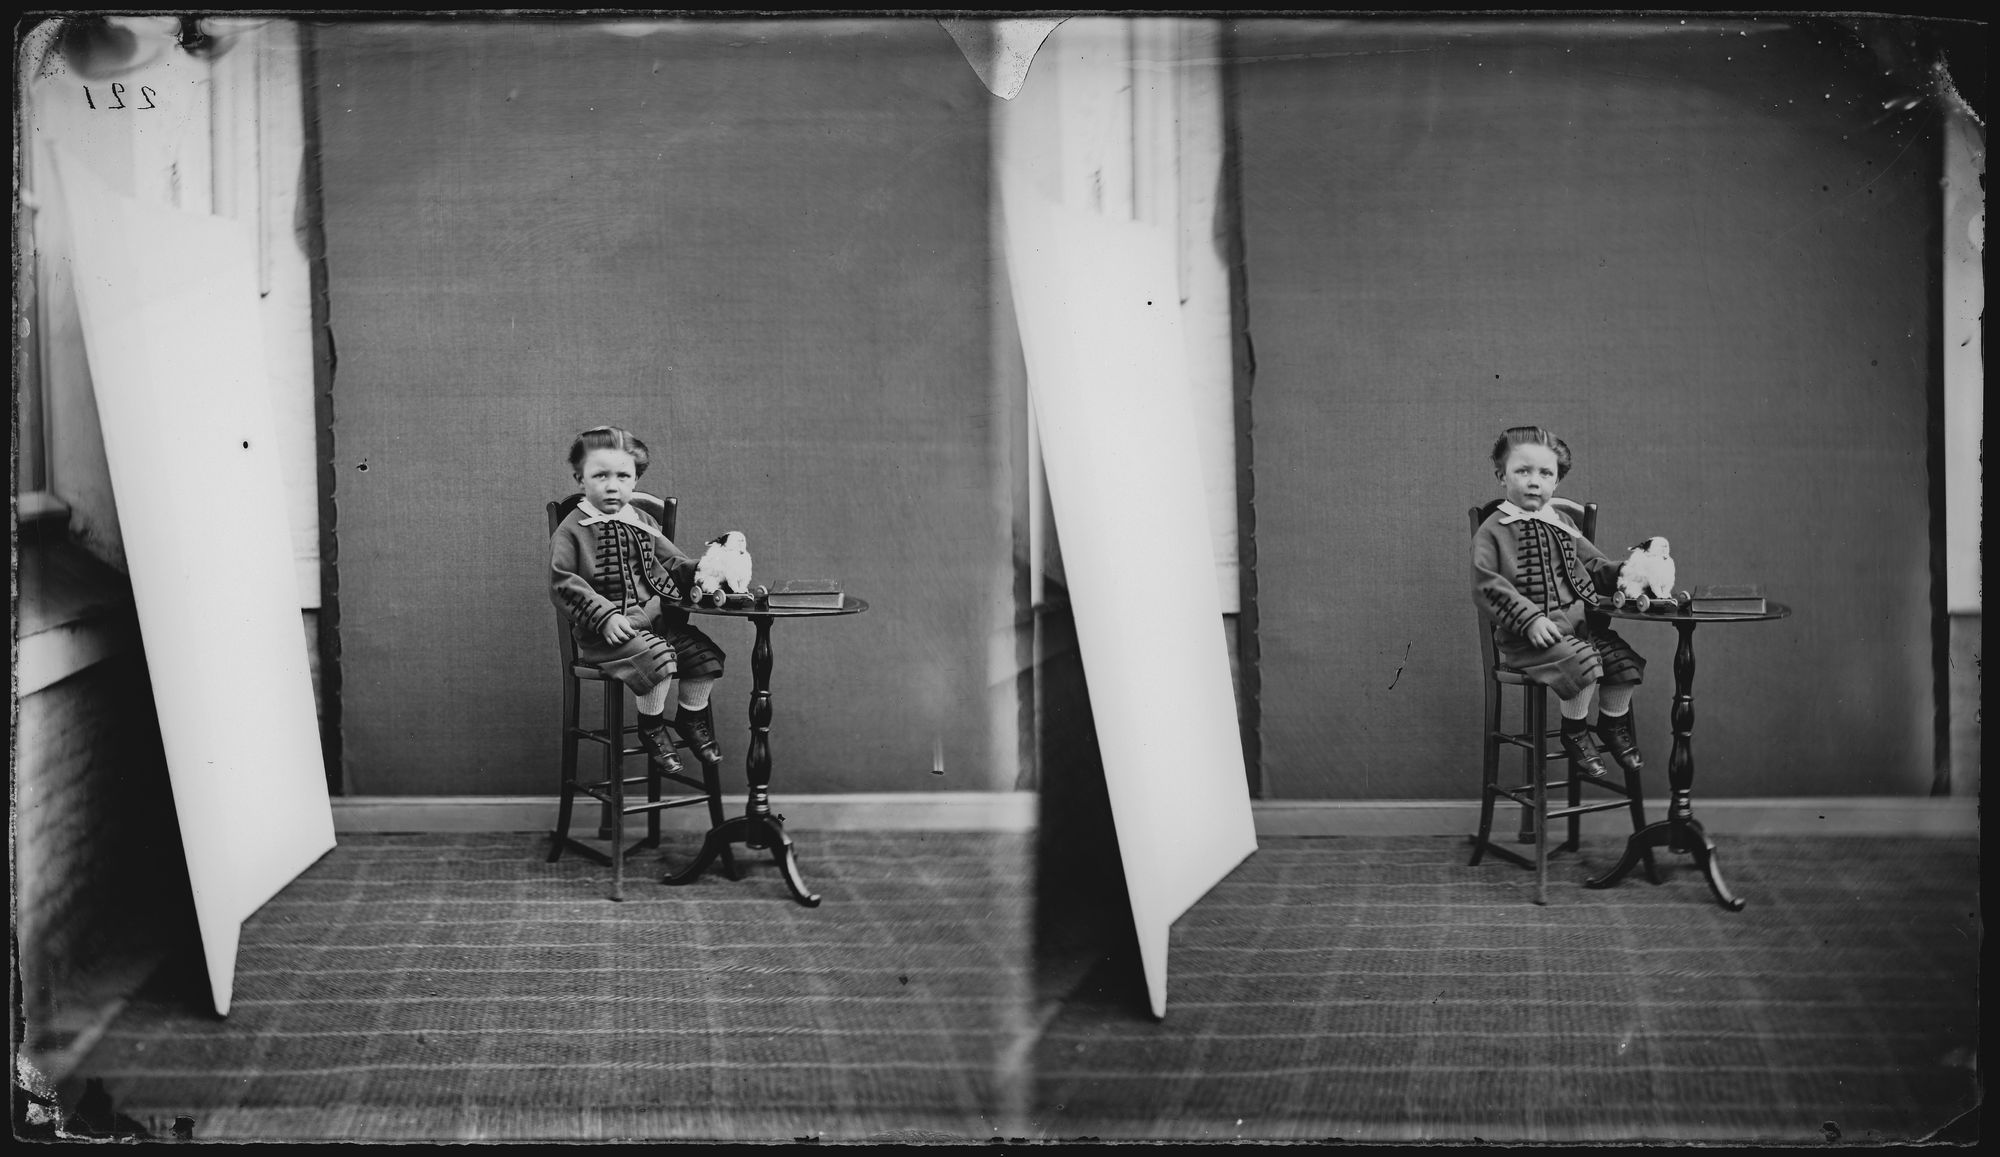 Portret van kind in kostuum